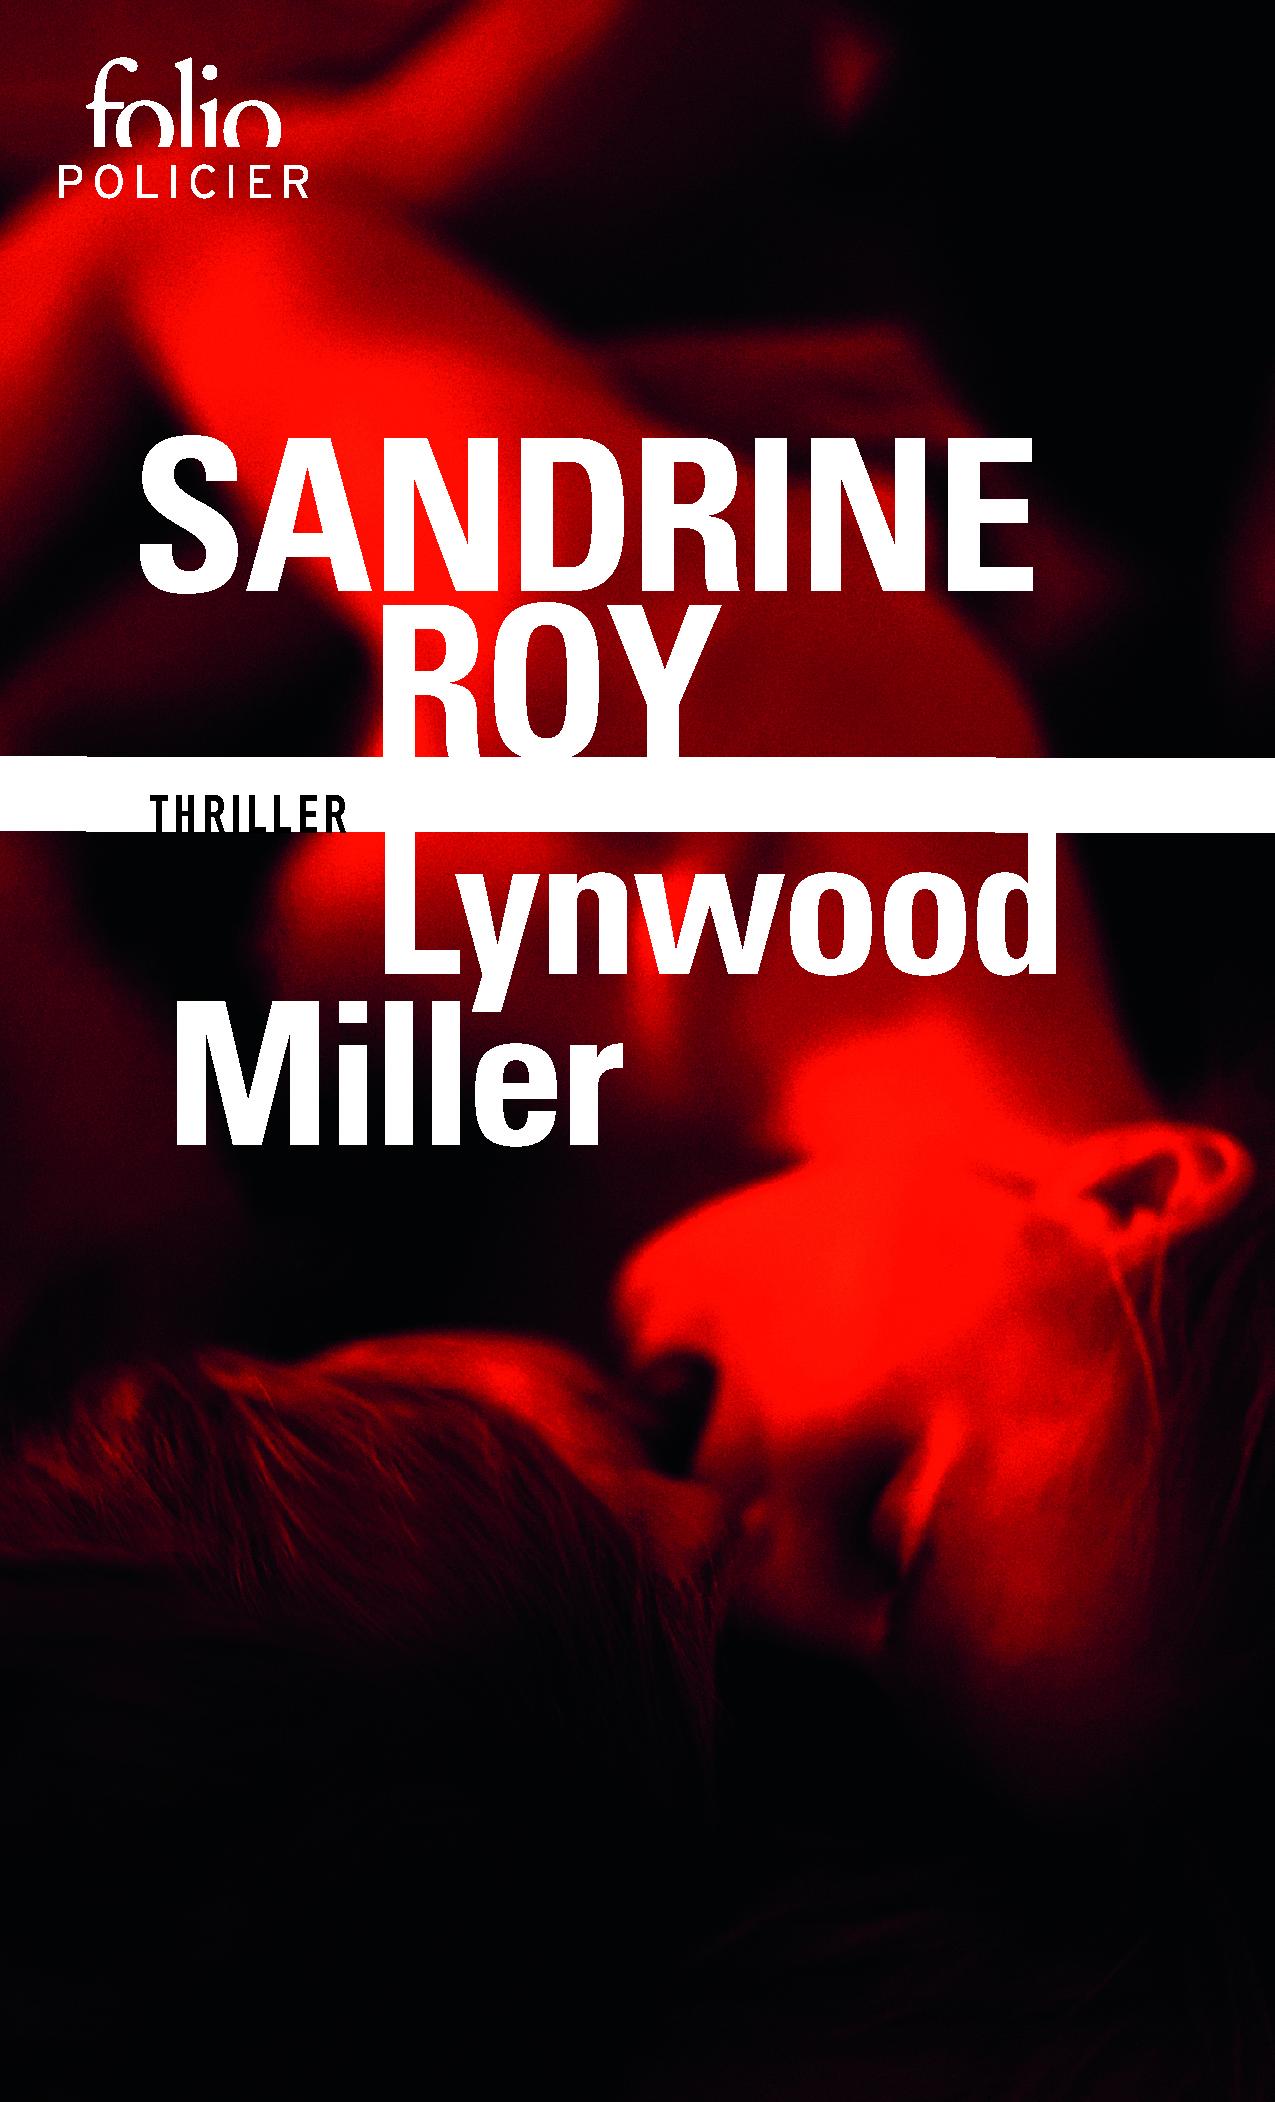 LYNWOOD MILLER